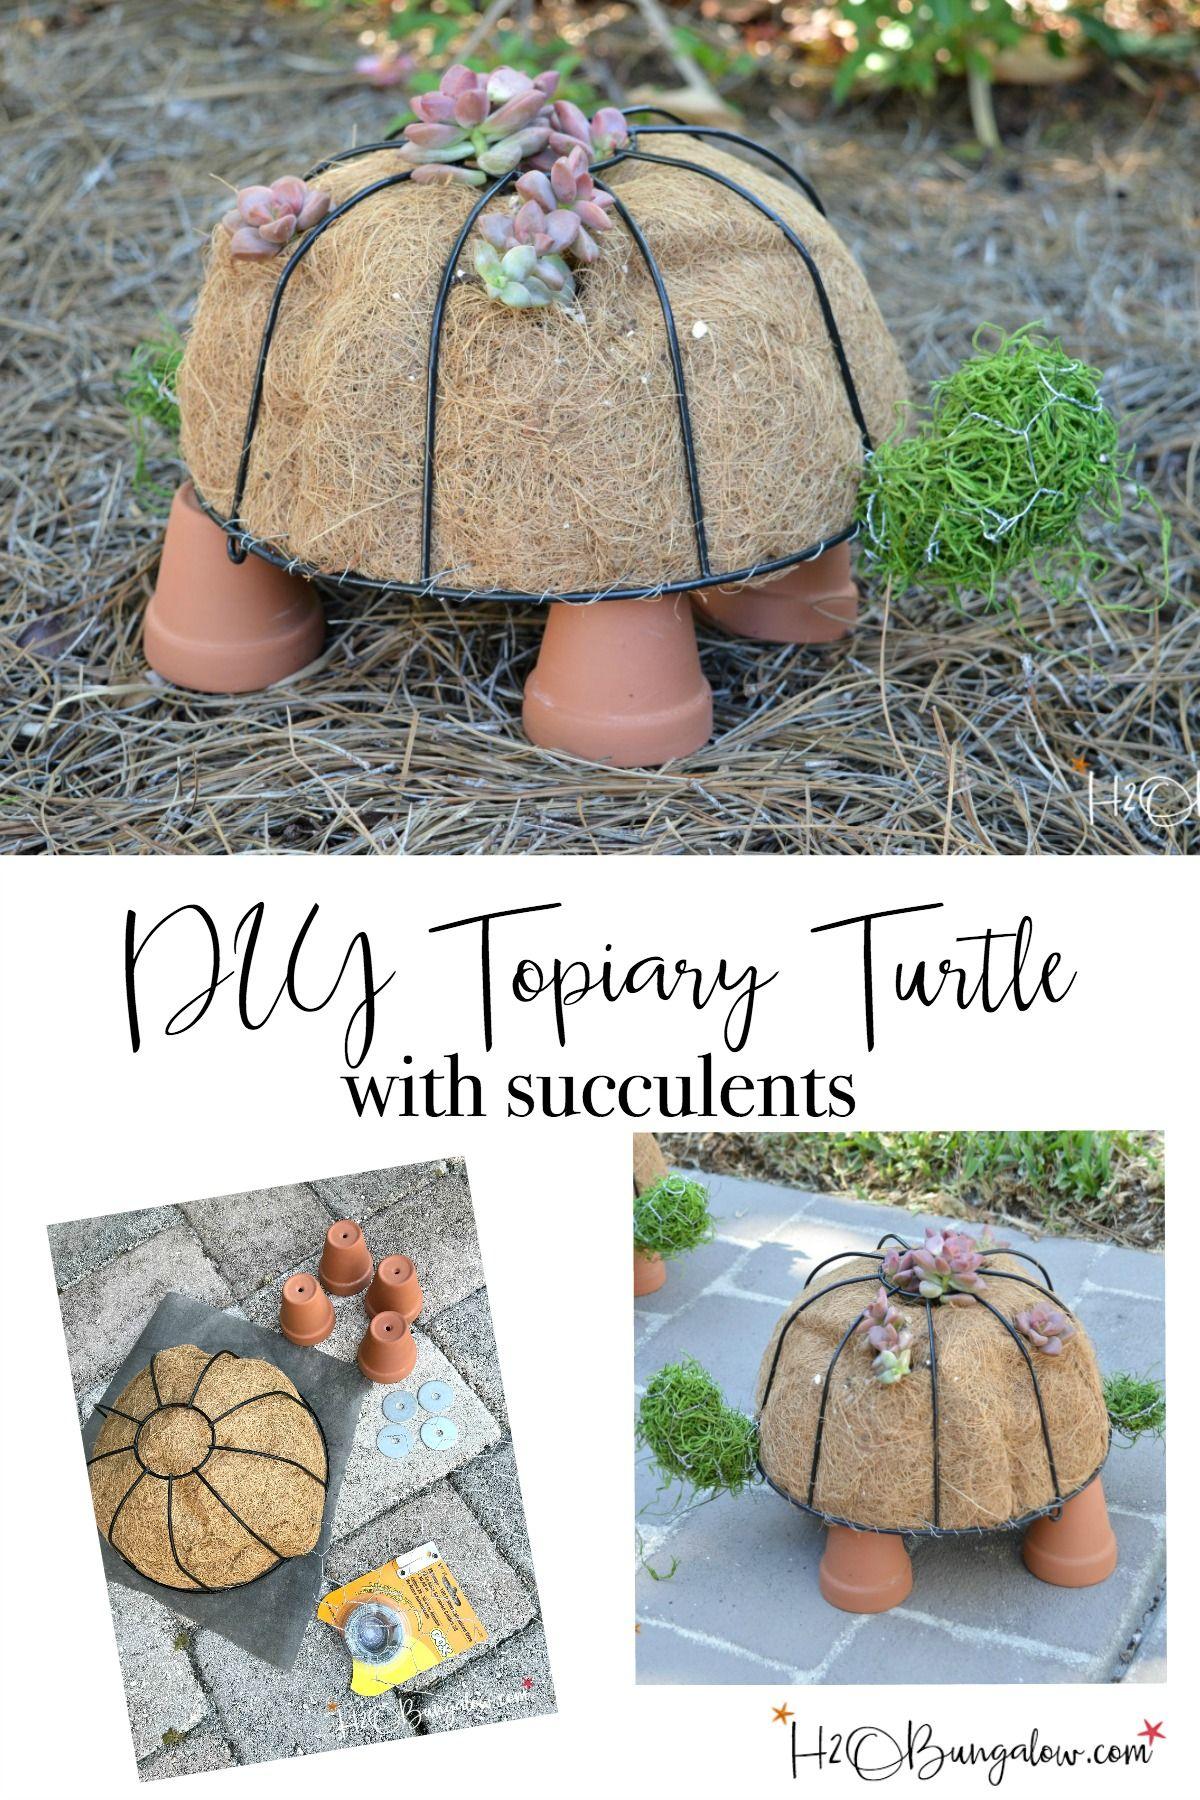 Unique diy home garden decor with a shoe planter and succulents - How To Make A Diy Turtle Topiary Diy Garden Decordiy Home